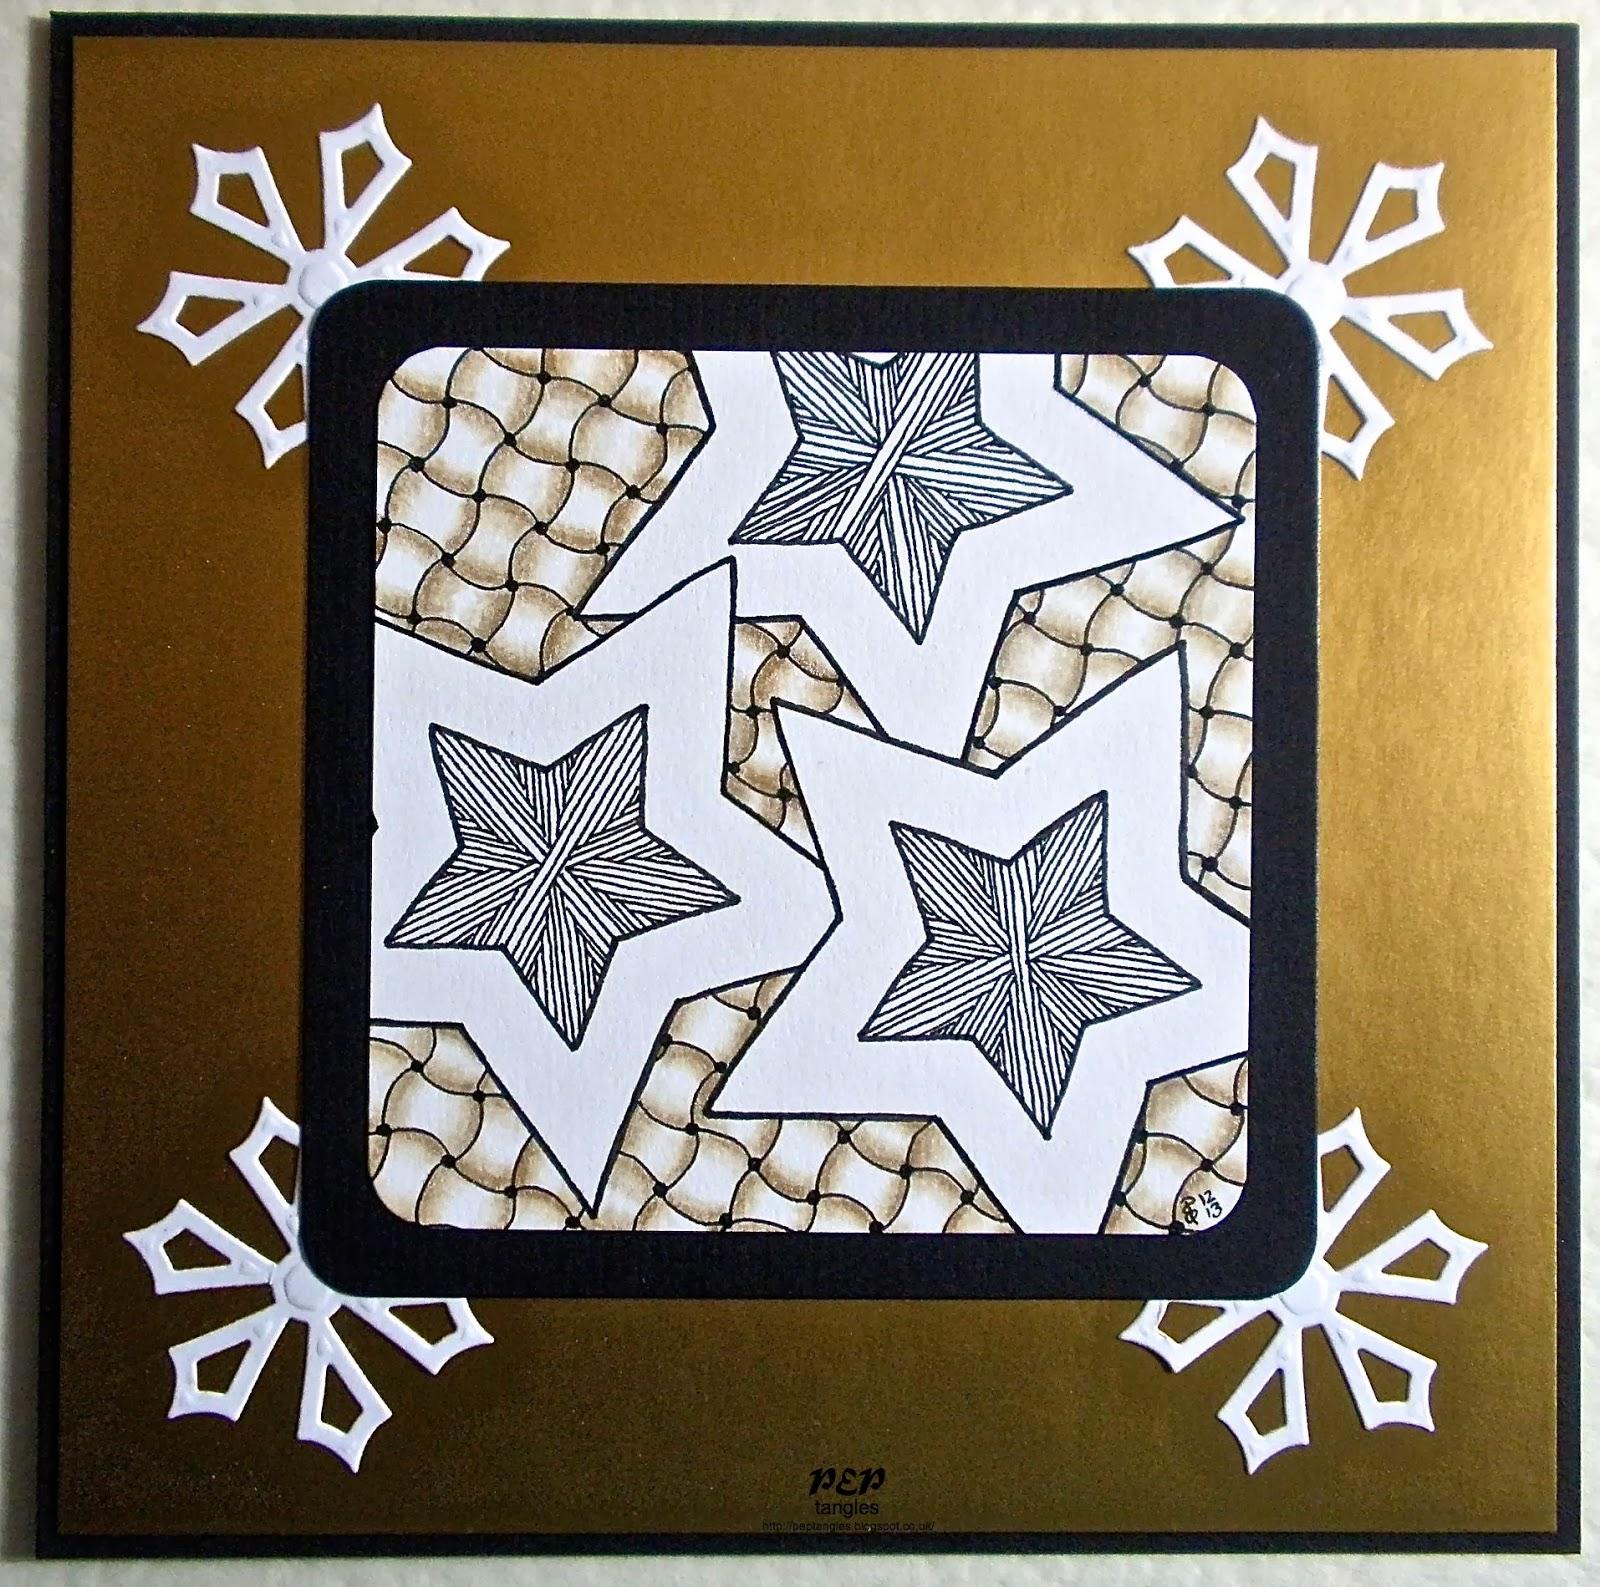 PEP tangles: Zentangle Inspired Christmas Cards